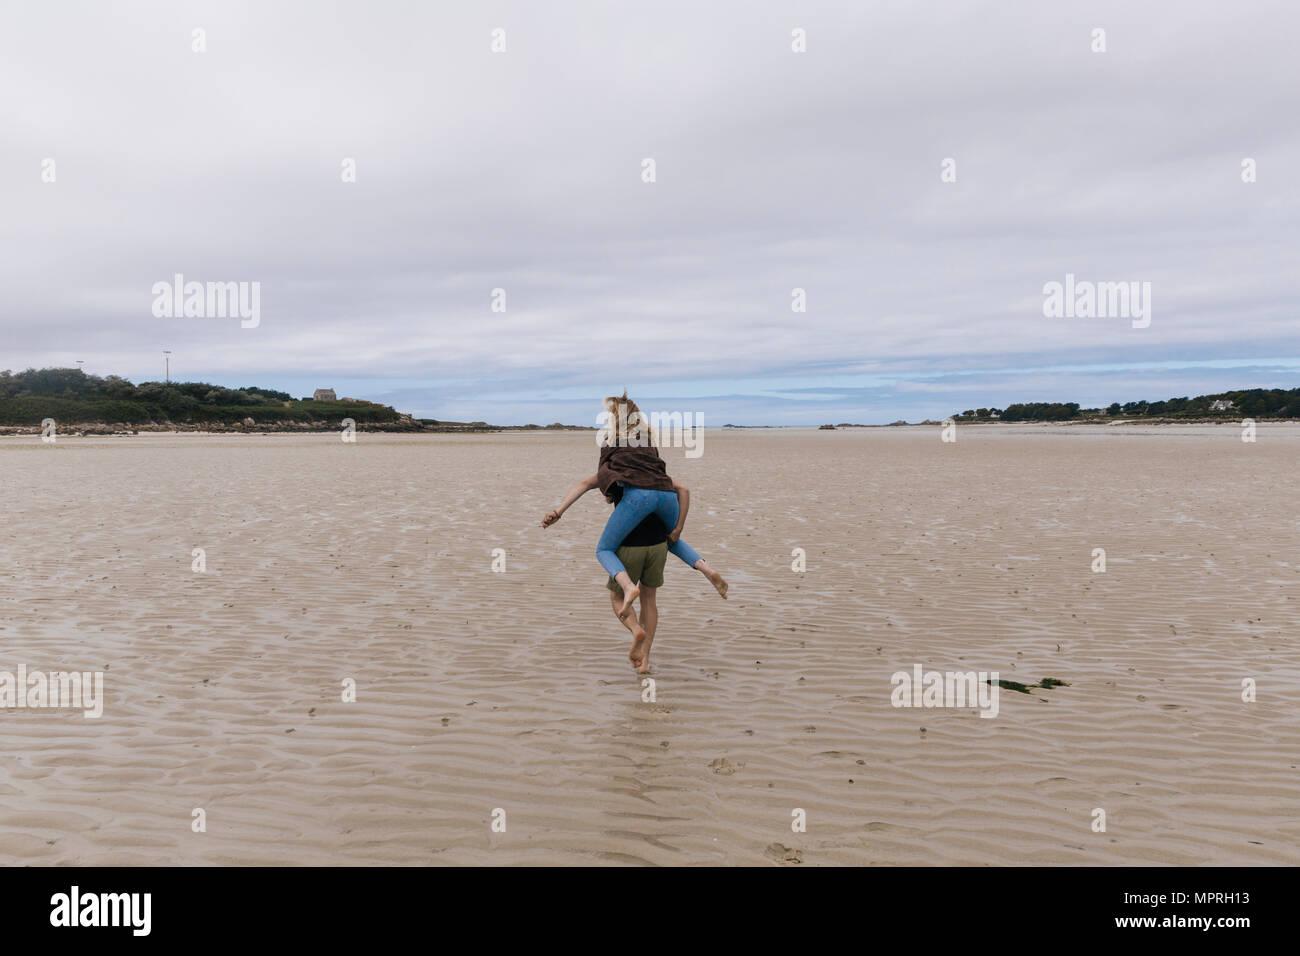 Frankreich, Bretagne, Guisseny, junge Mann laufen, die freundin Huckepack am Strand Stockbild